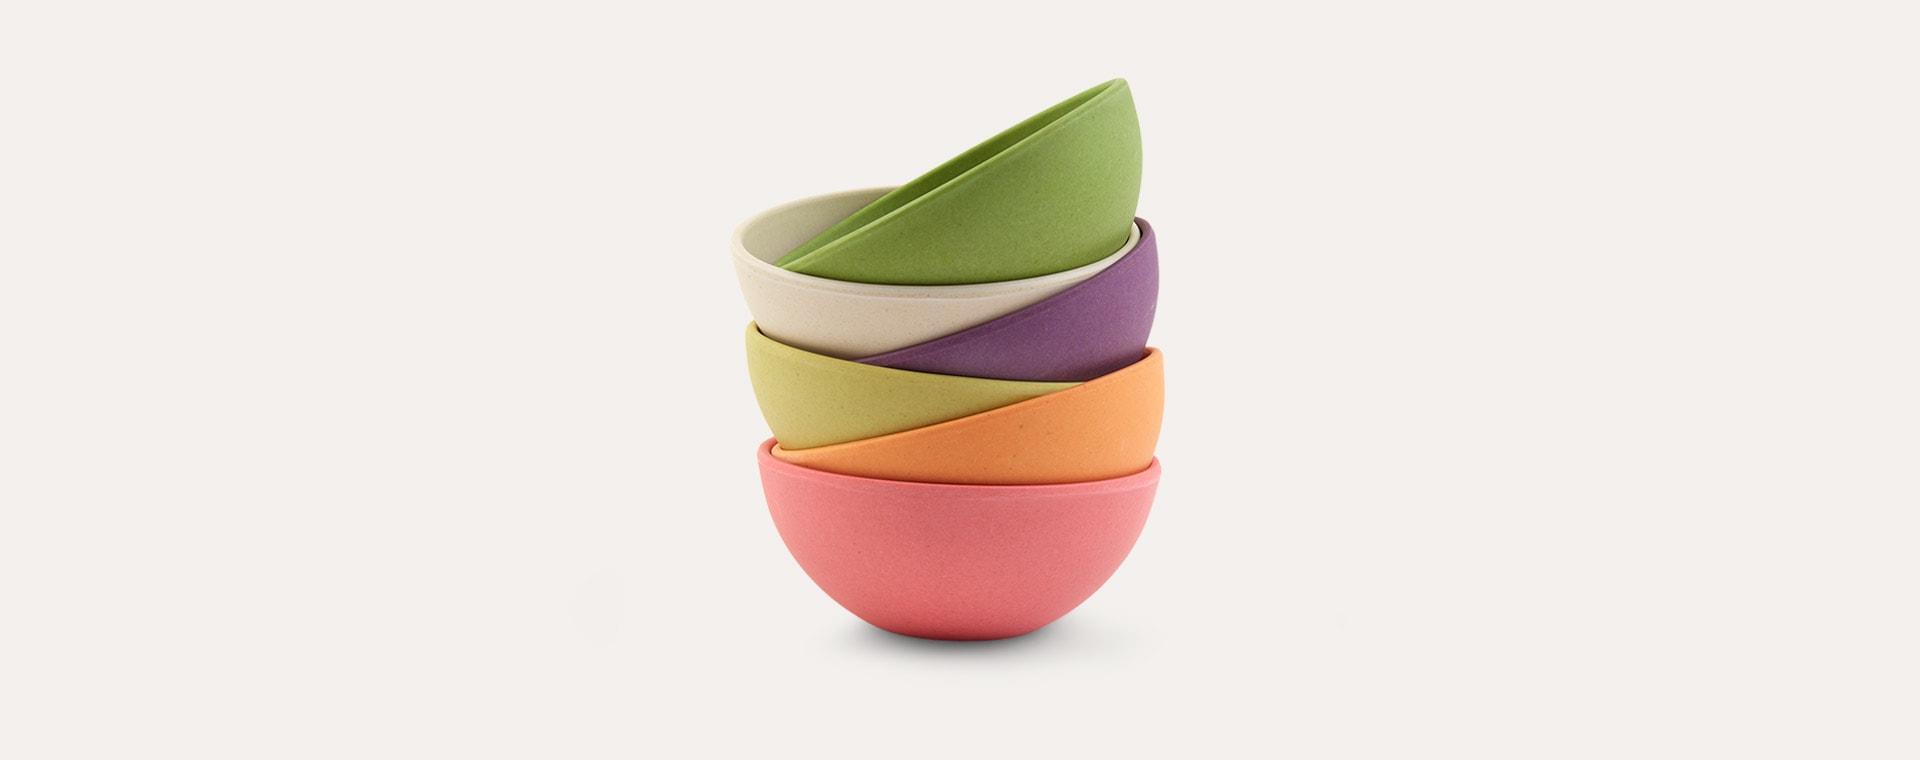 Rainbow Zuperzozial Mini Bowls Set Of 6